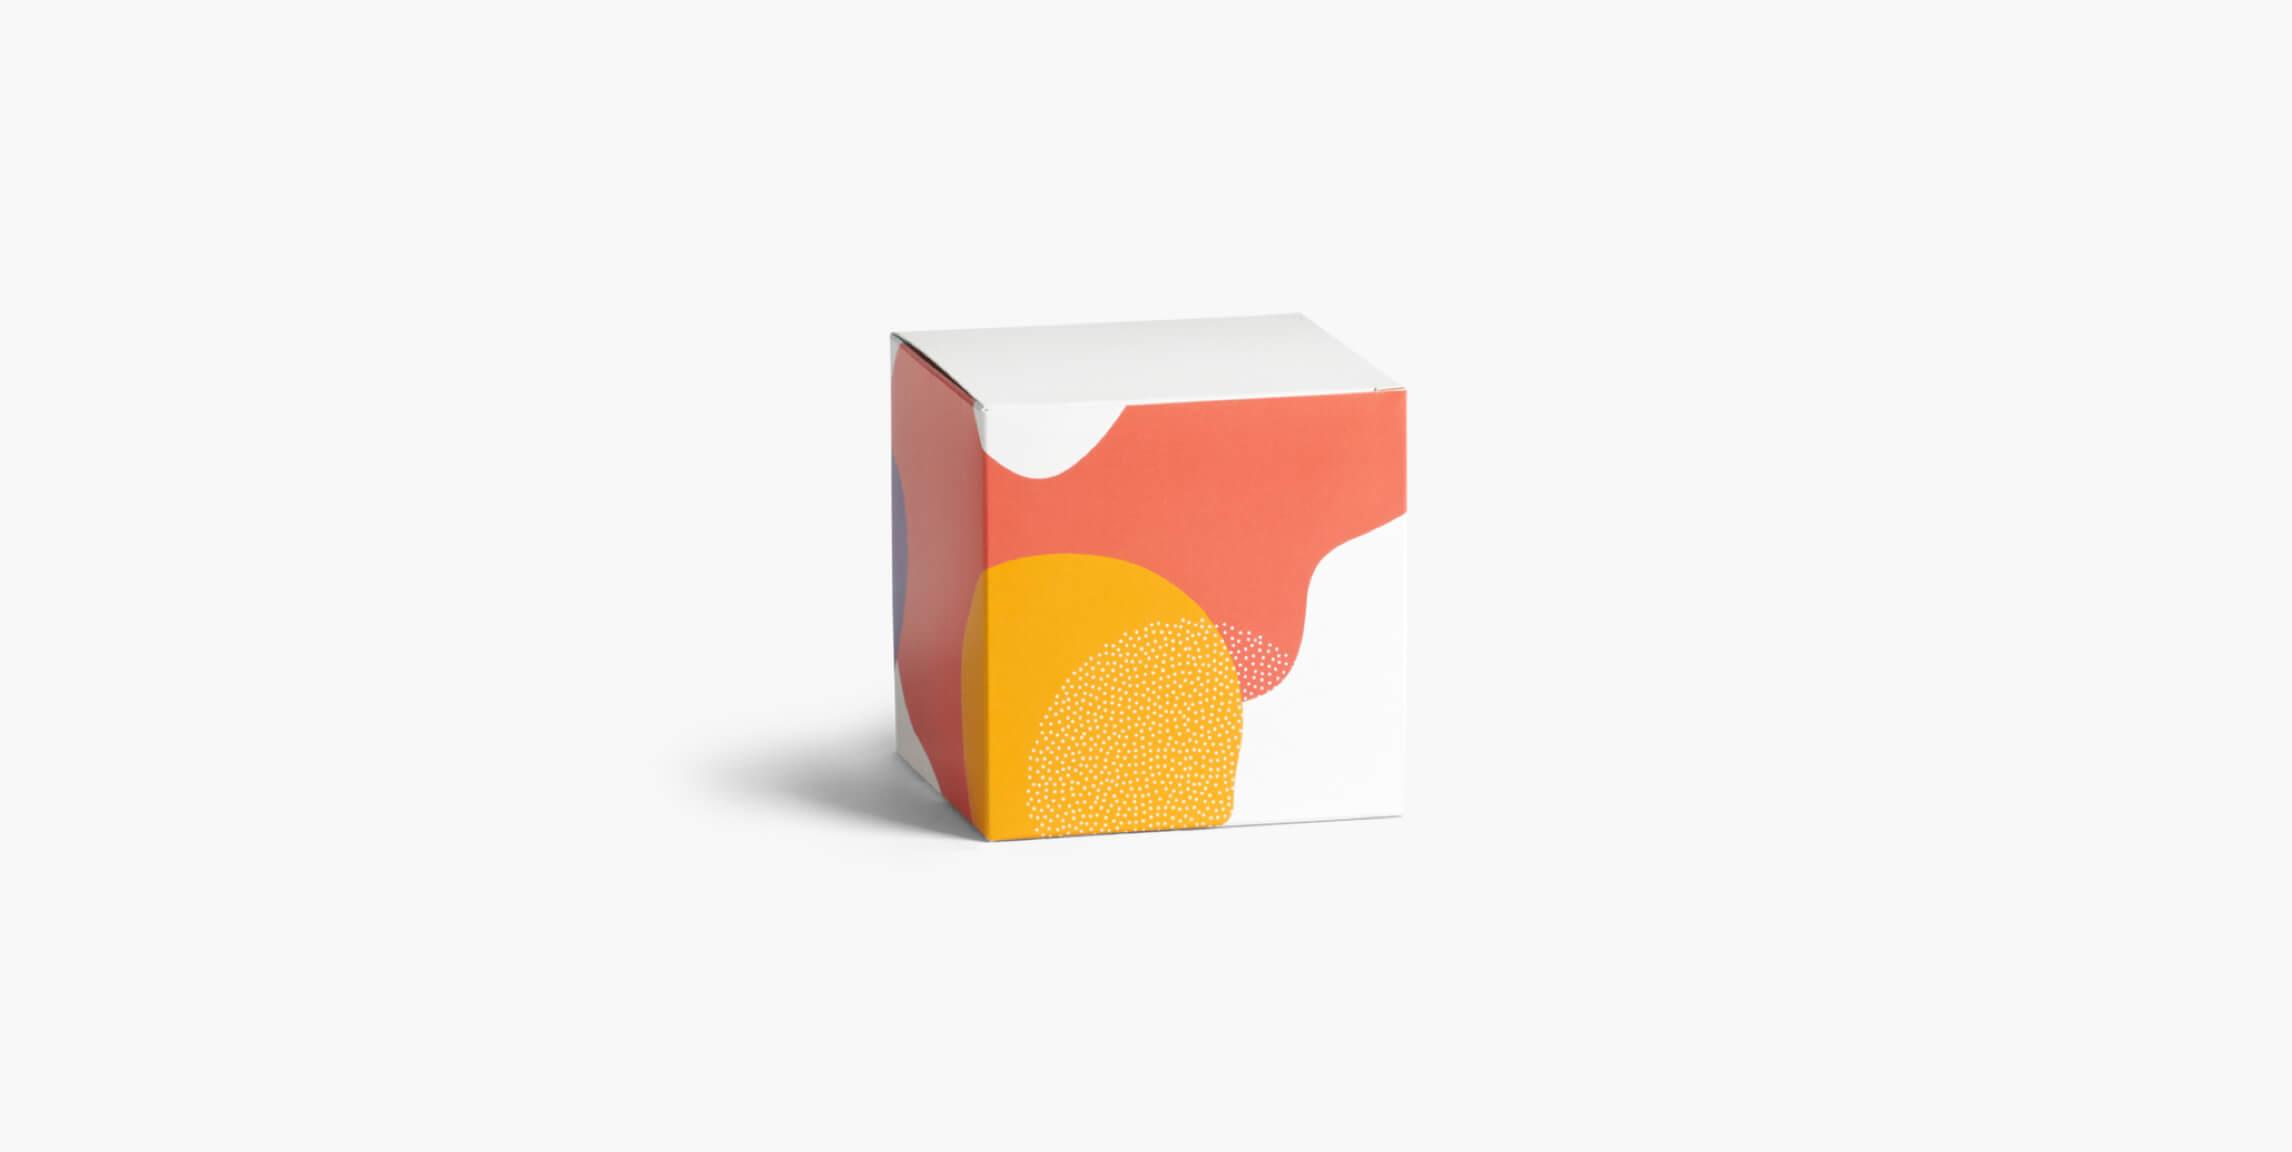 Faltschachteln - individuellen Verpackungen - Packhelp